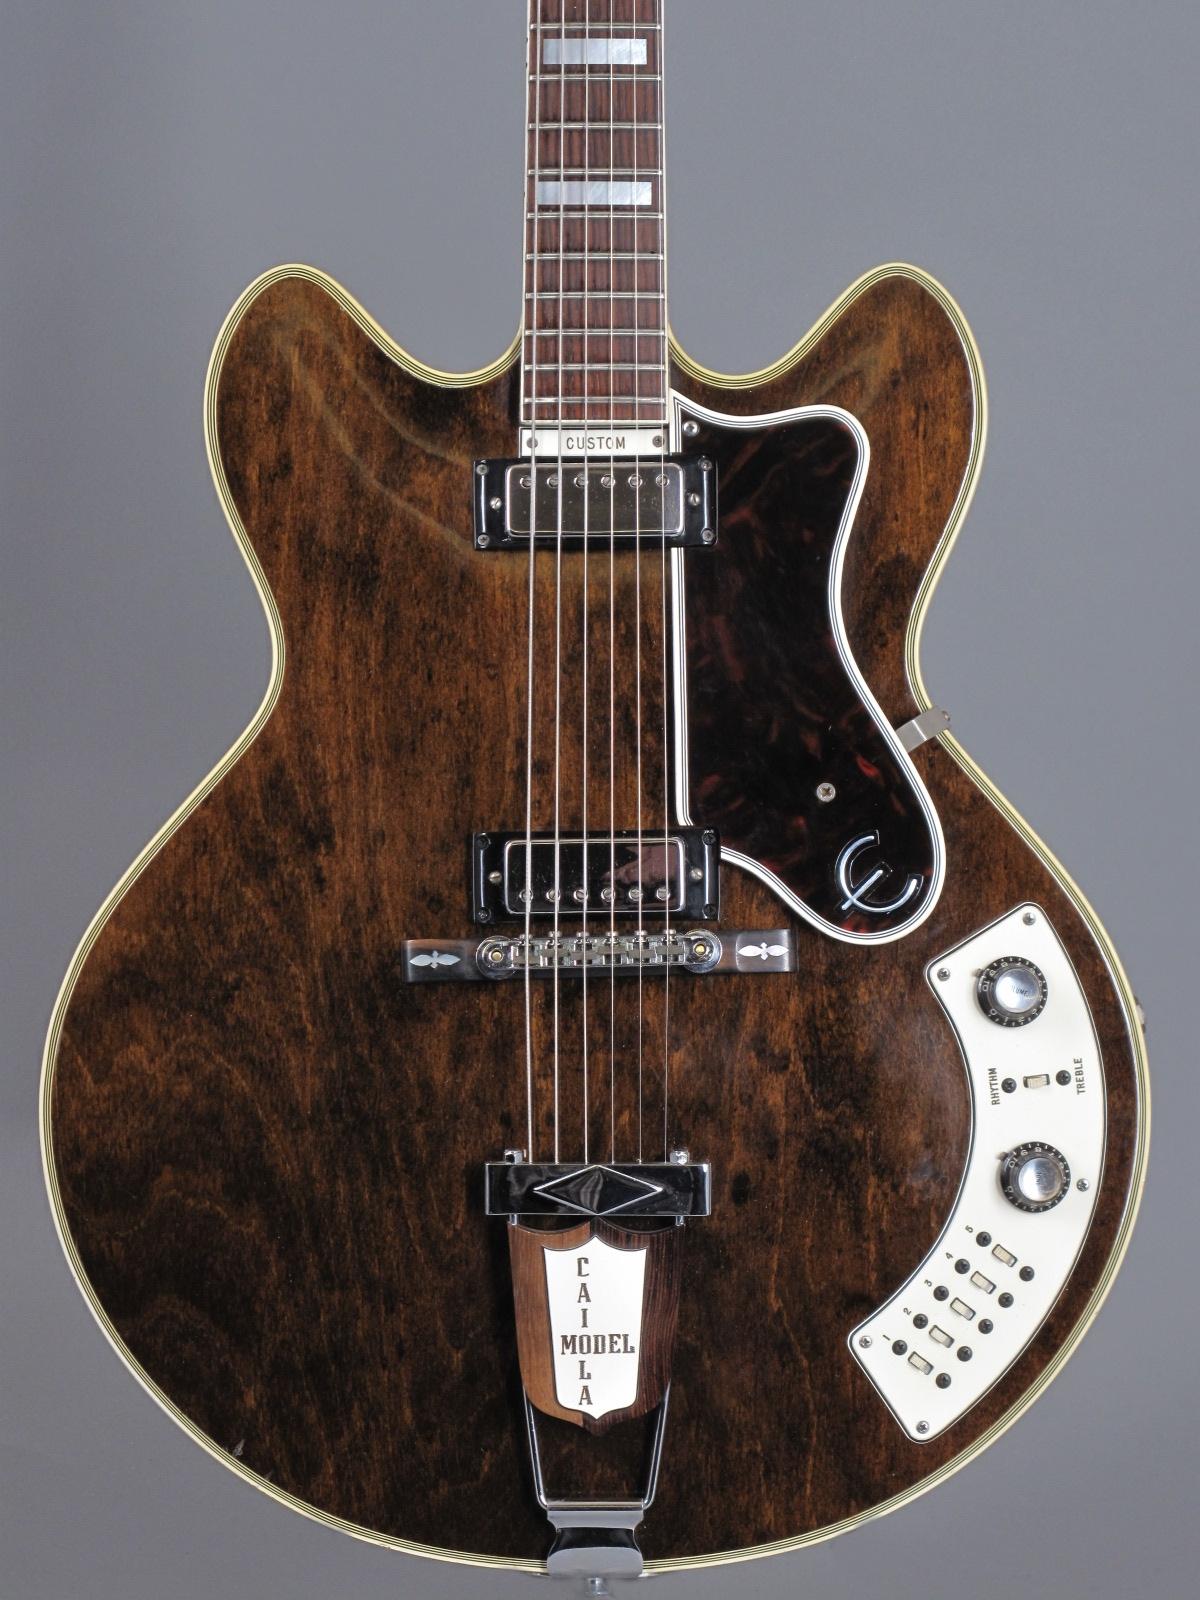 1968 Epiphone Caila Custom - Walnut